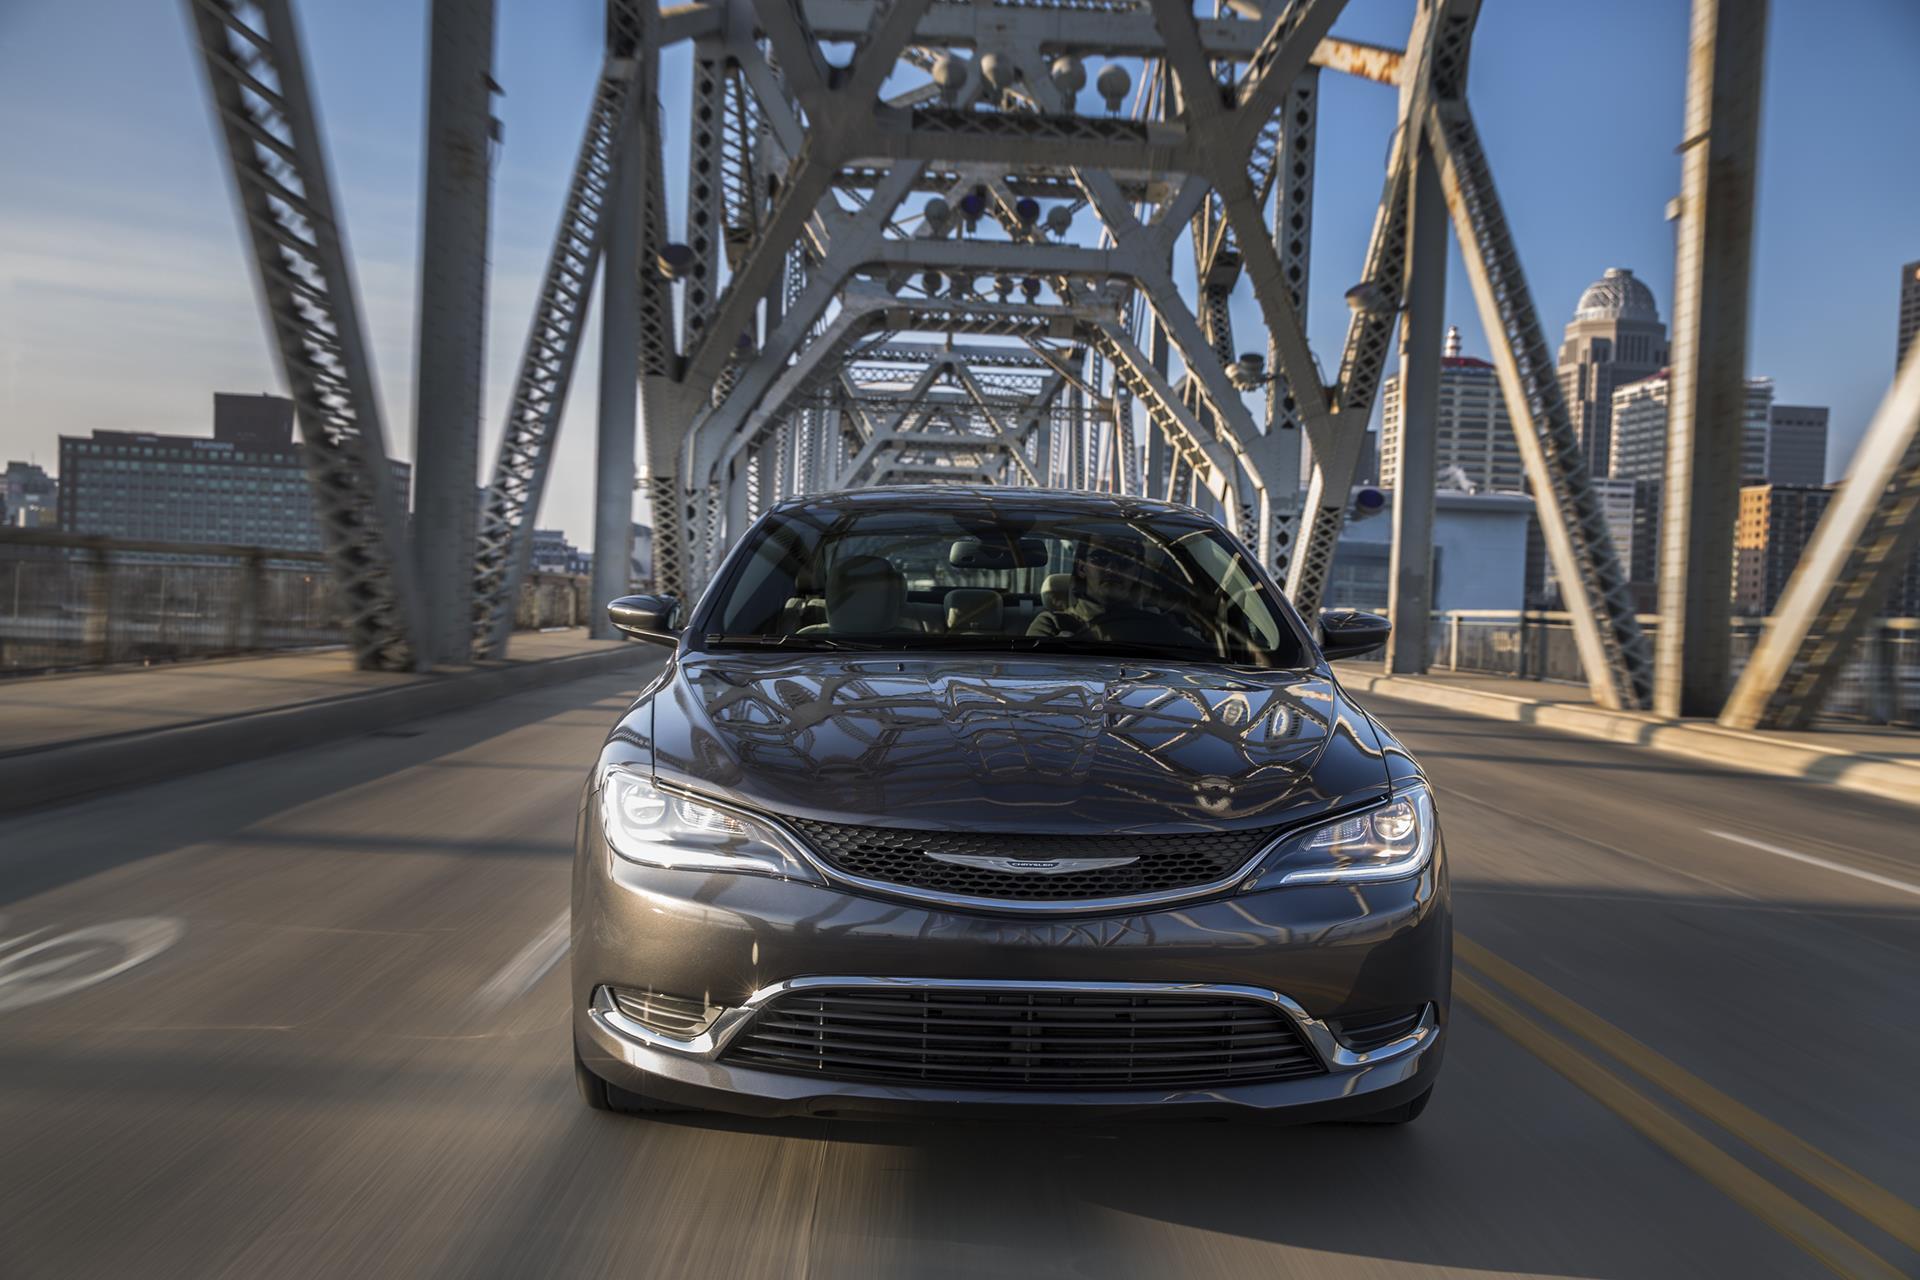 Chrysler 200: Electronic Vehicle Information Center (EVIC) Displays